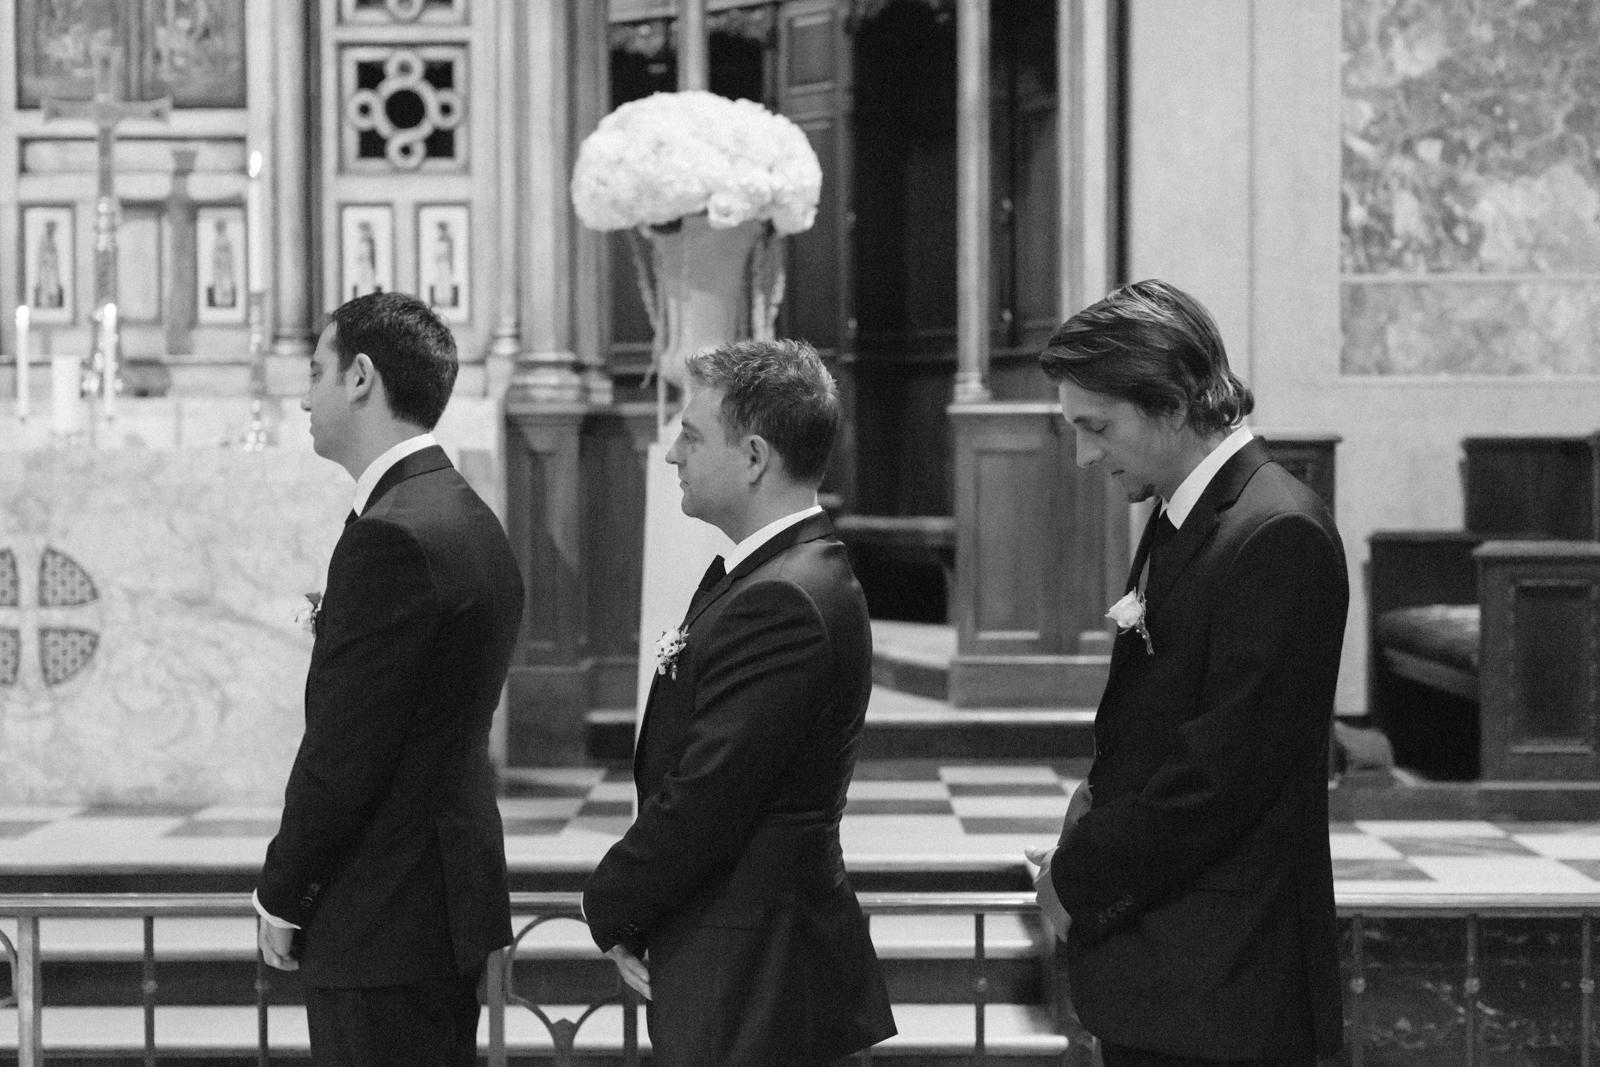 NYC Wedding Photography Sofitel Central Park Brooklyn Photographer Boris Zaretsky _B2C2367.jpg